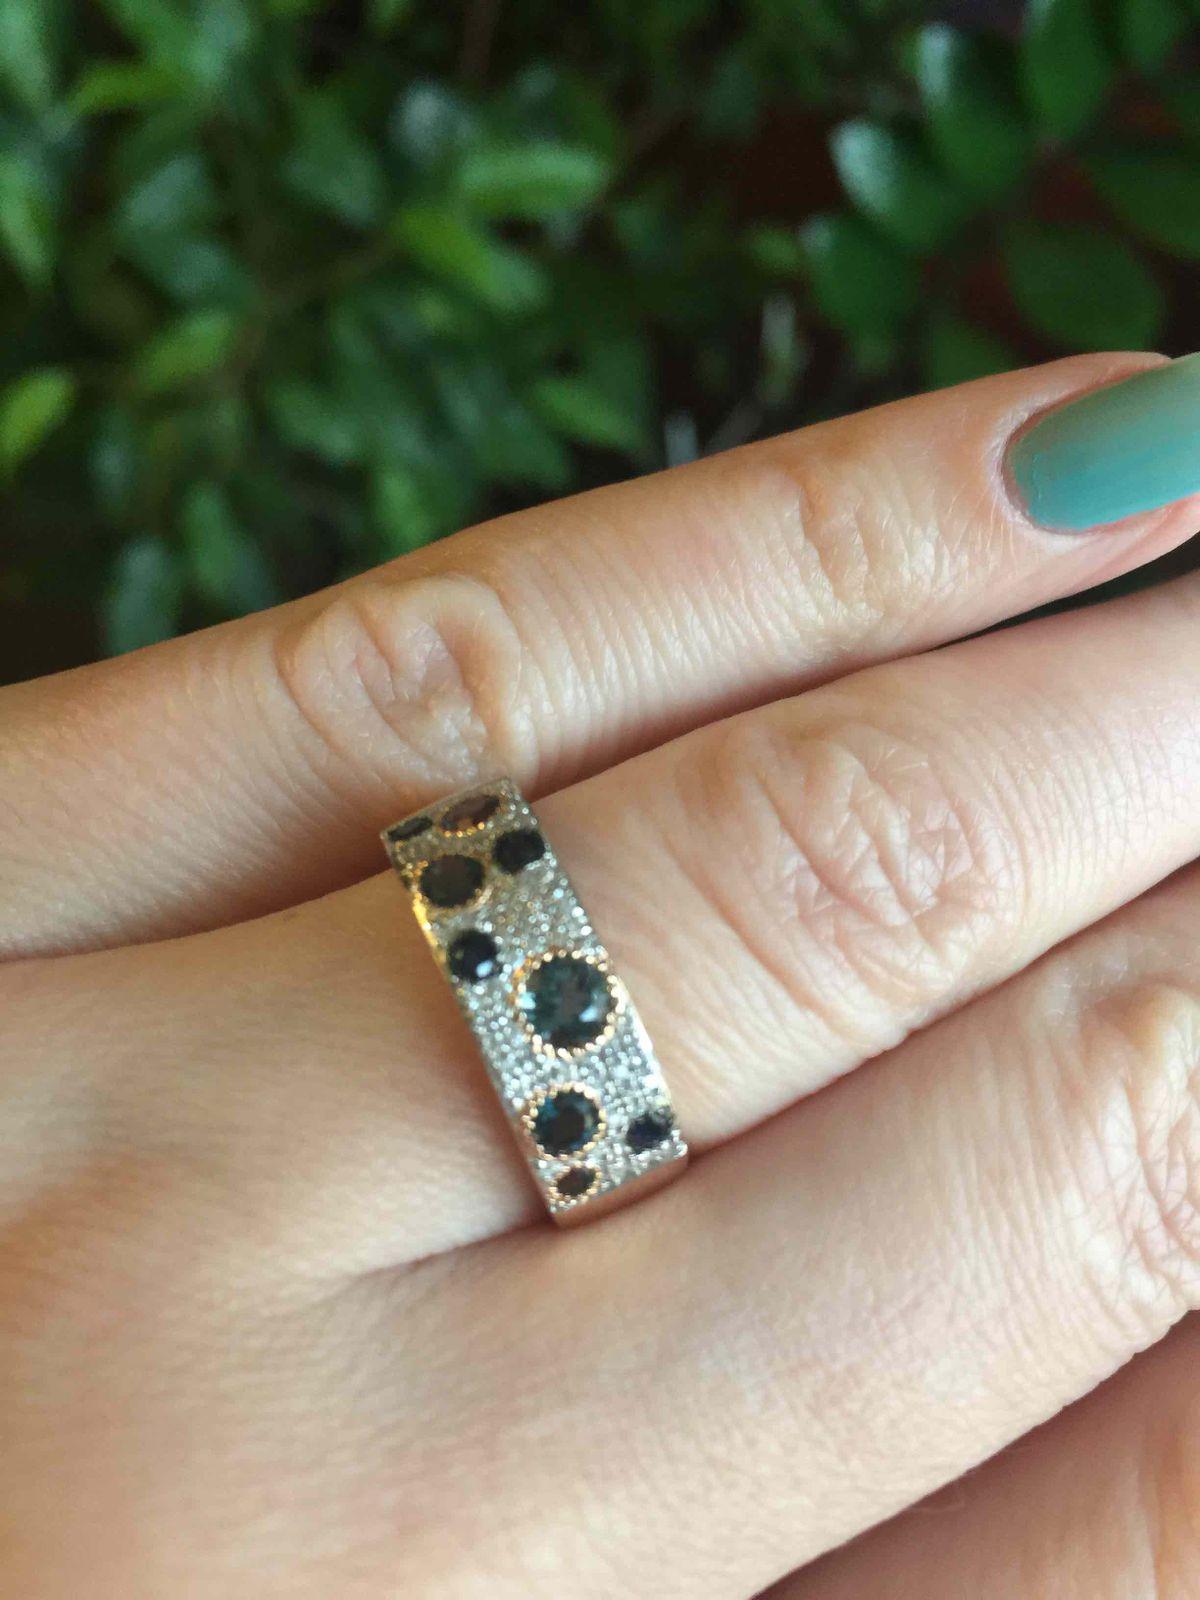 Супер классное кольцо